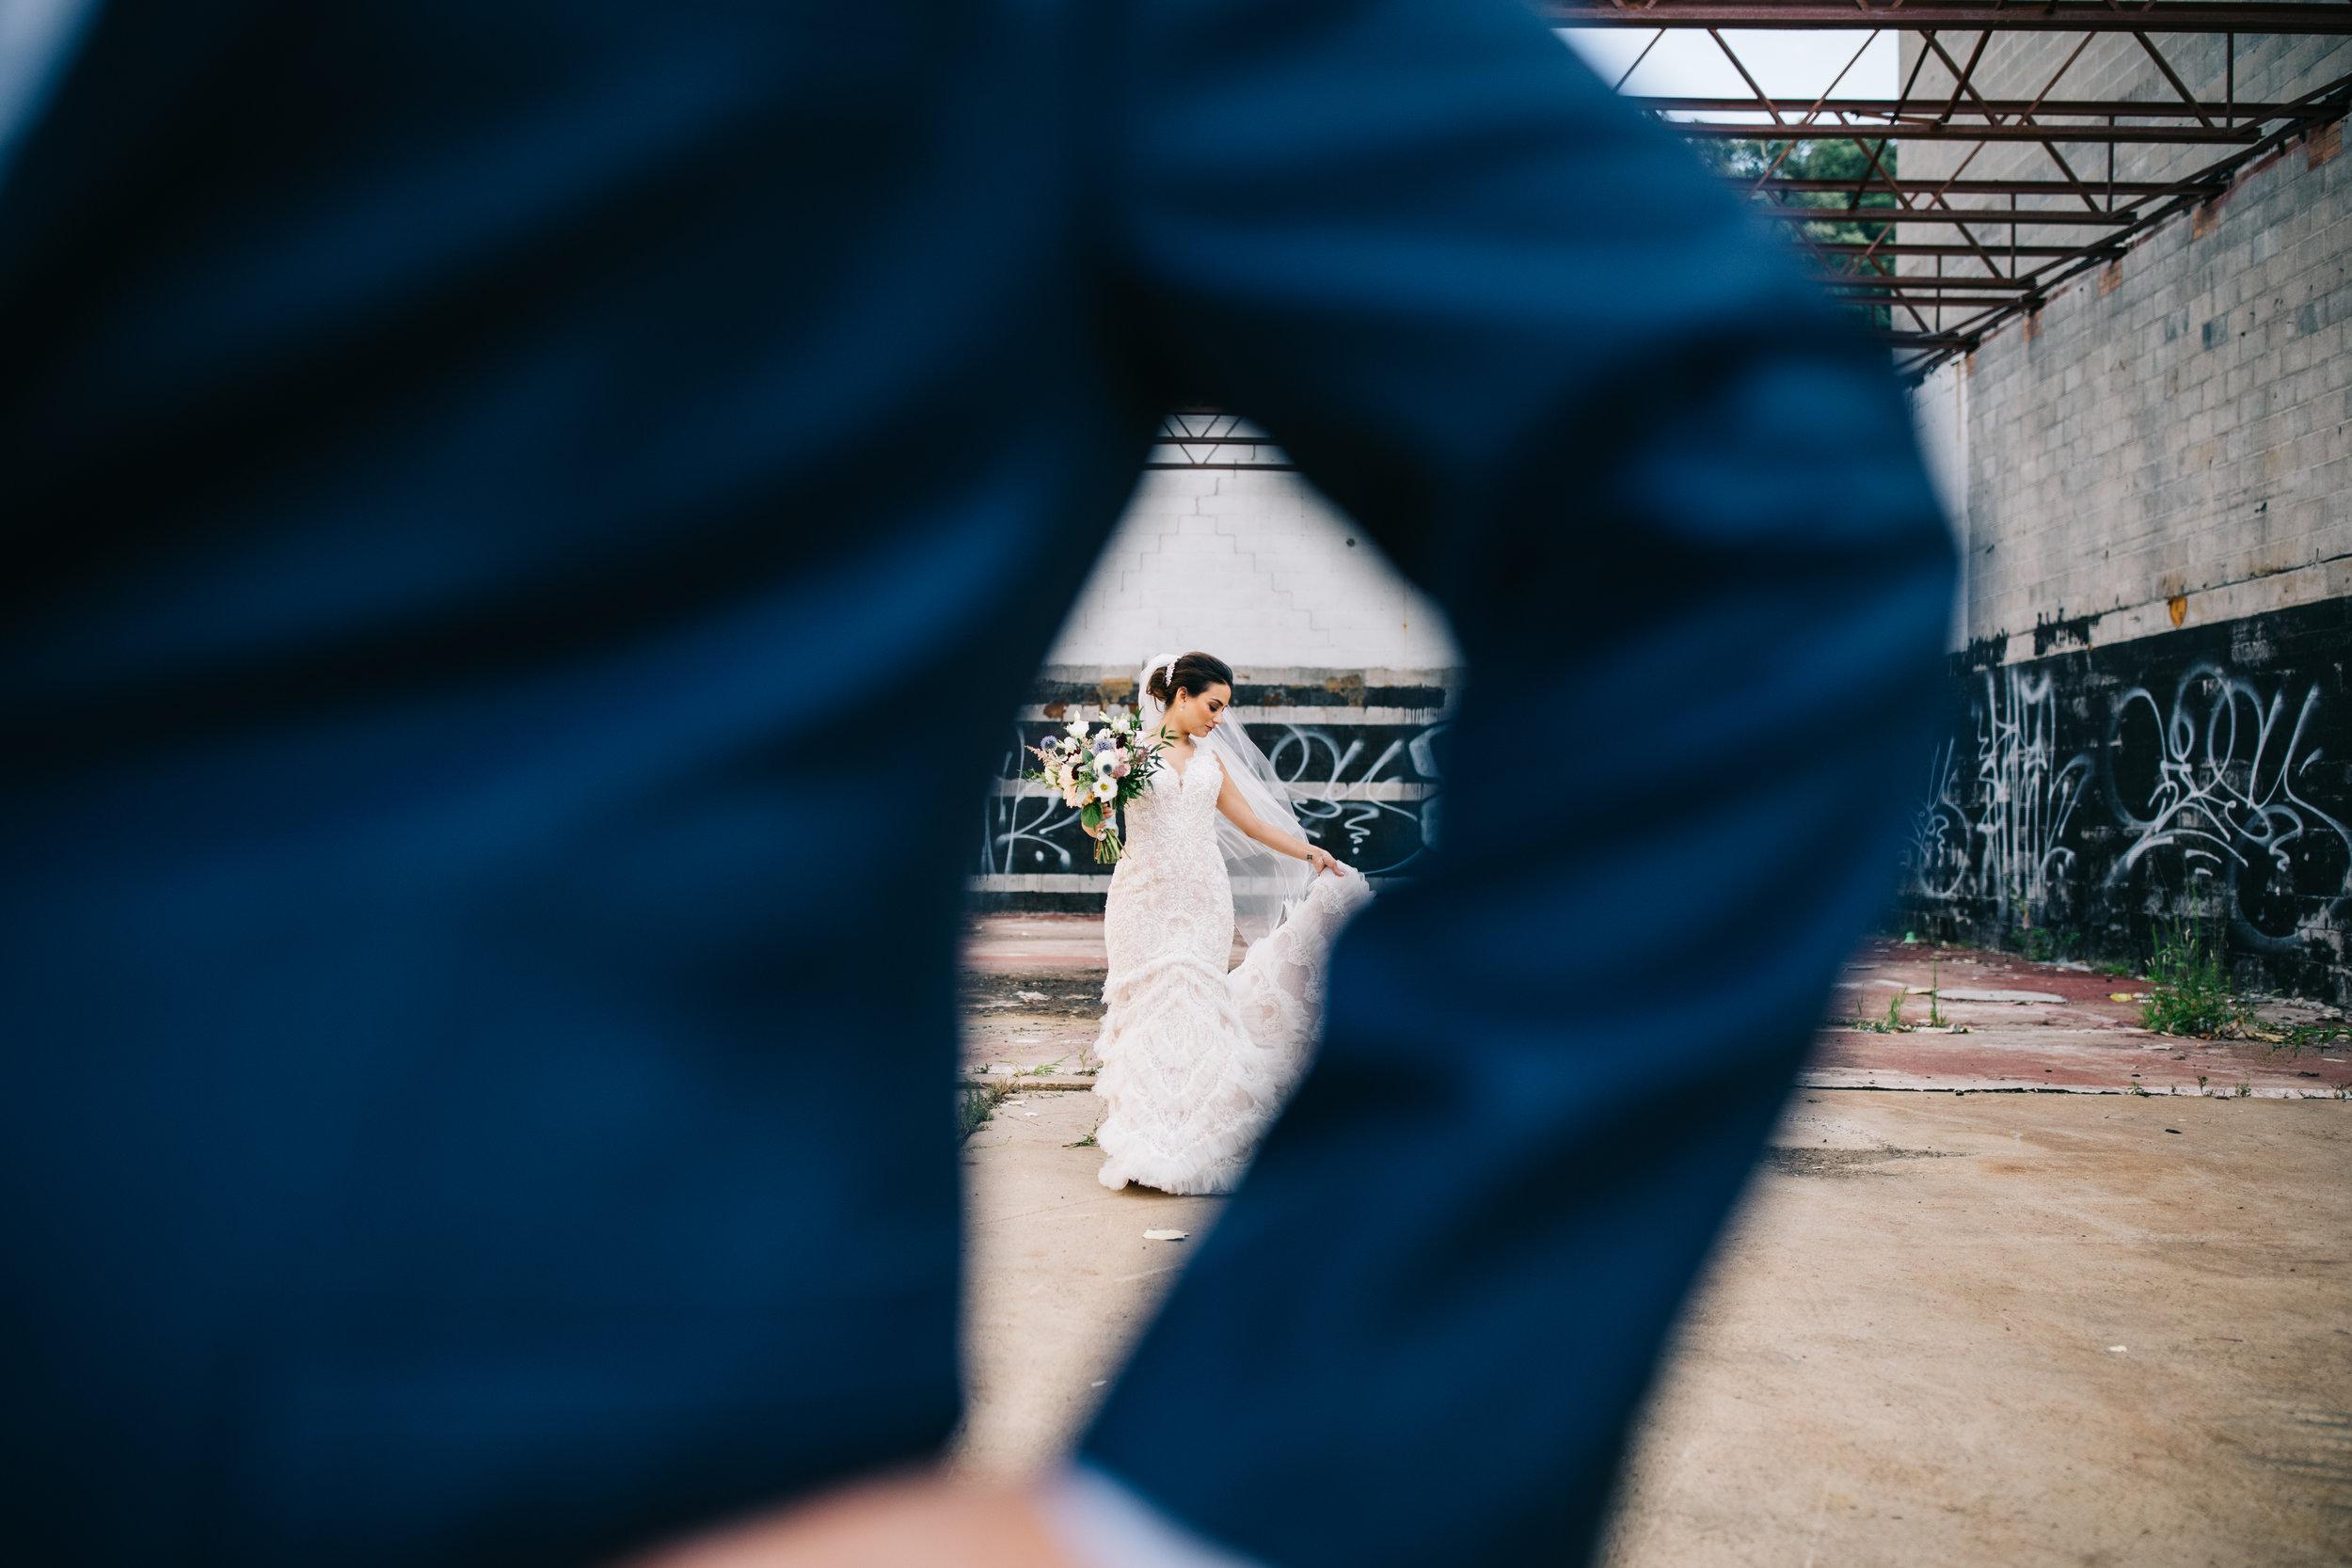 Jesse & Val - Pittsburgh Opera House wedding-2 copy.jpg